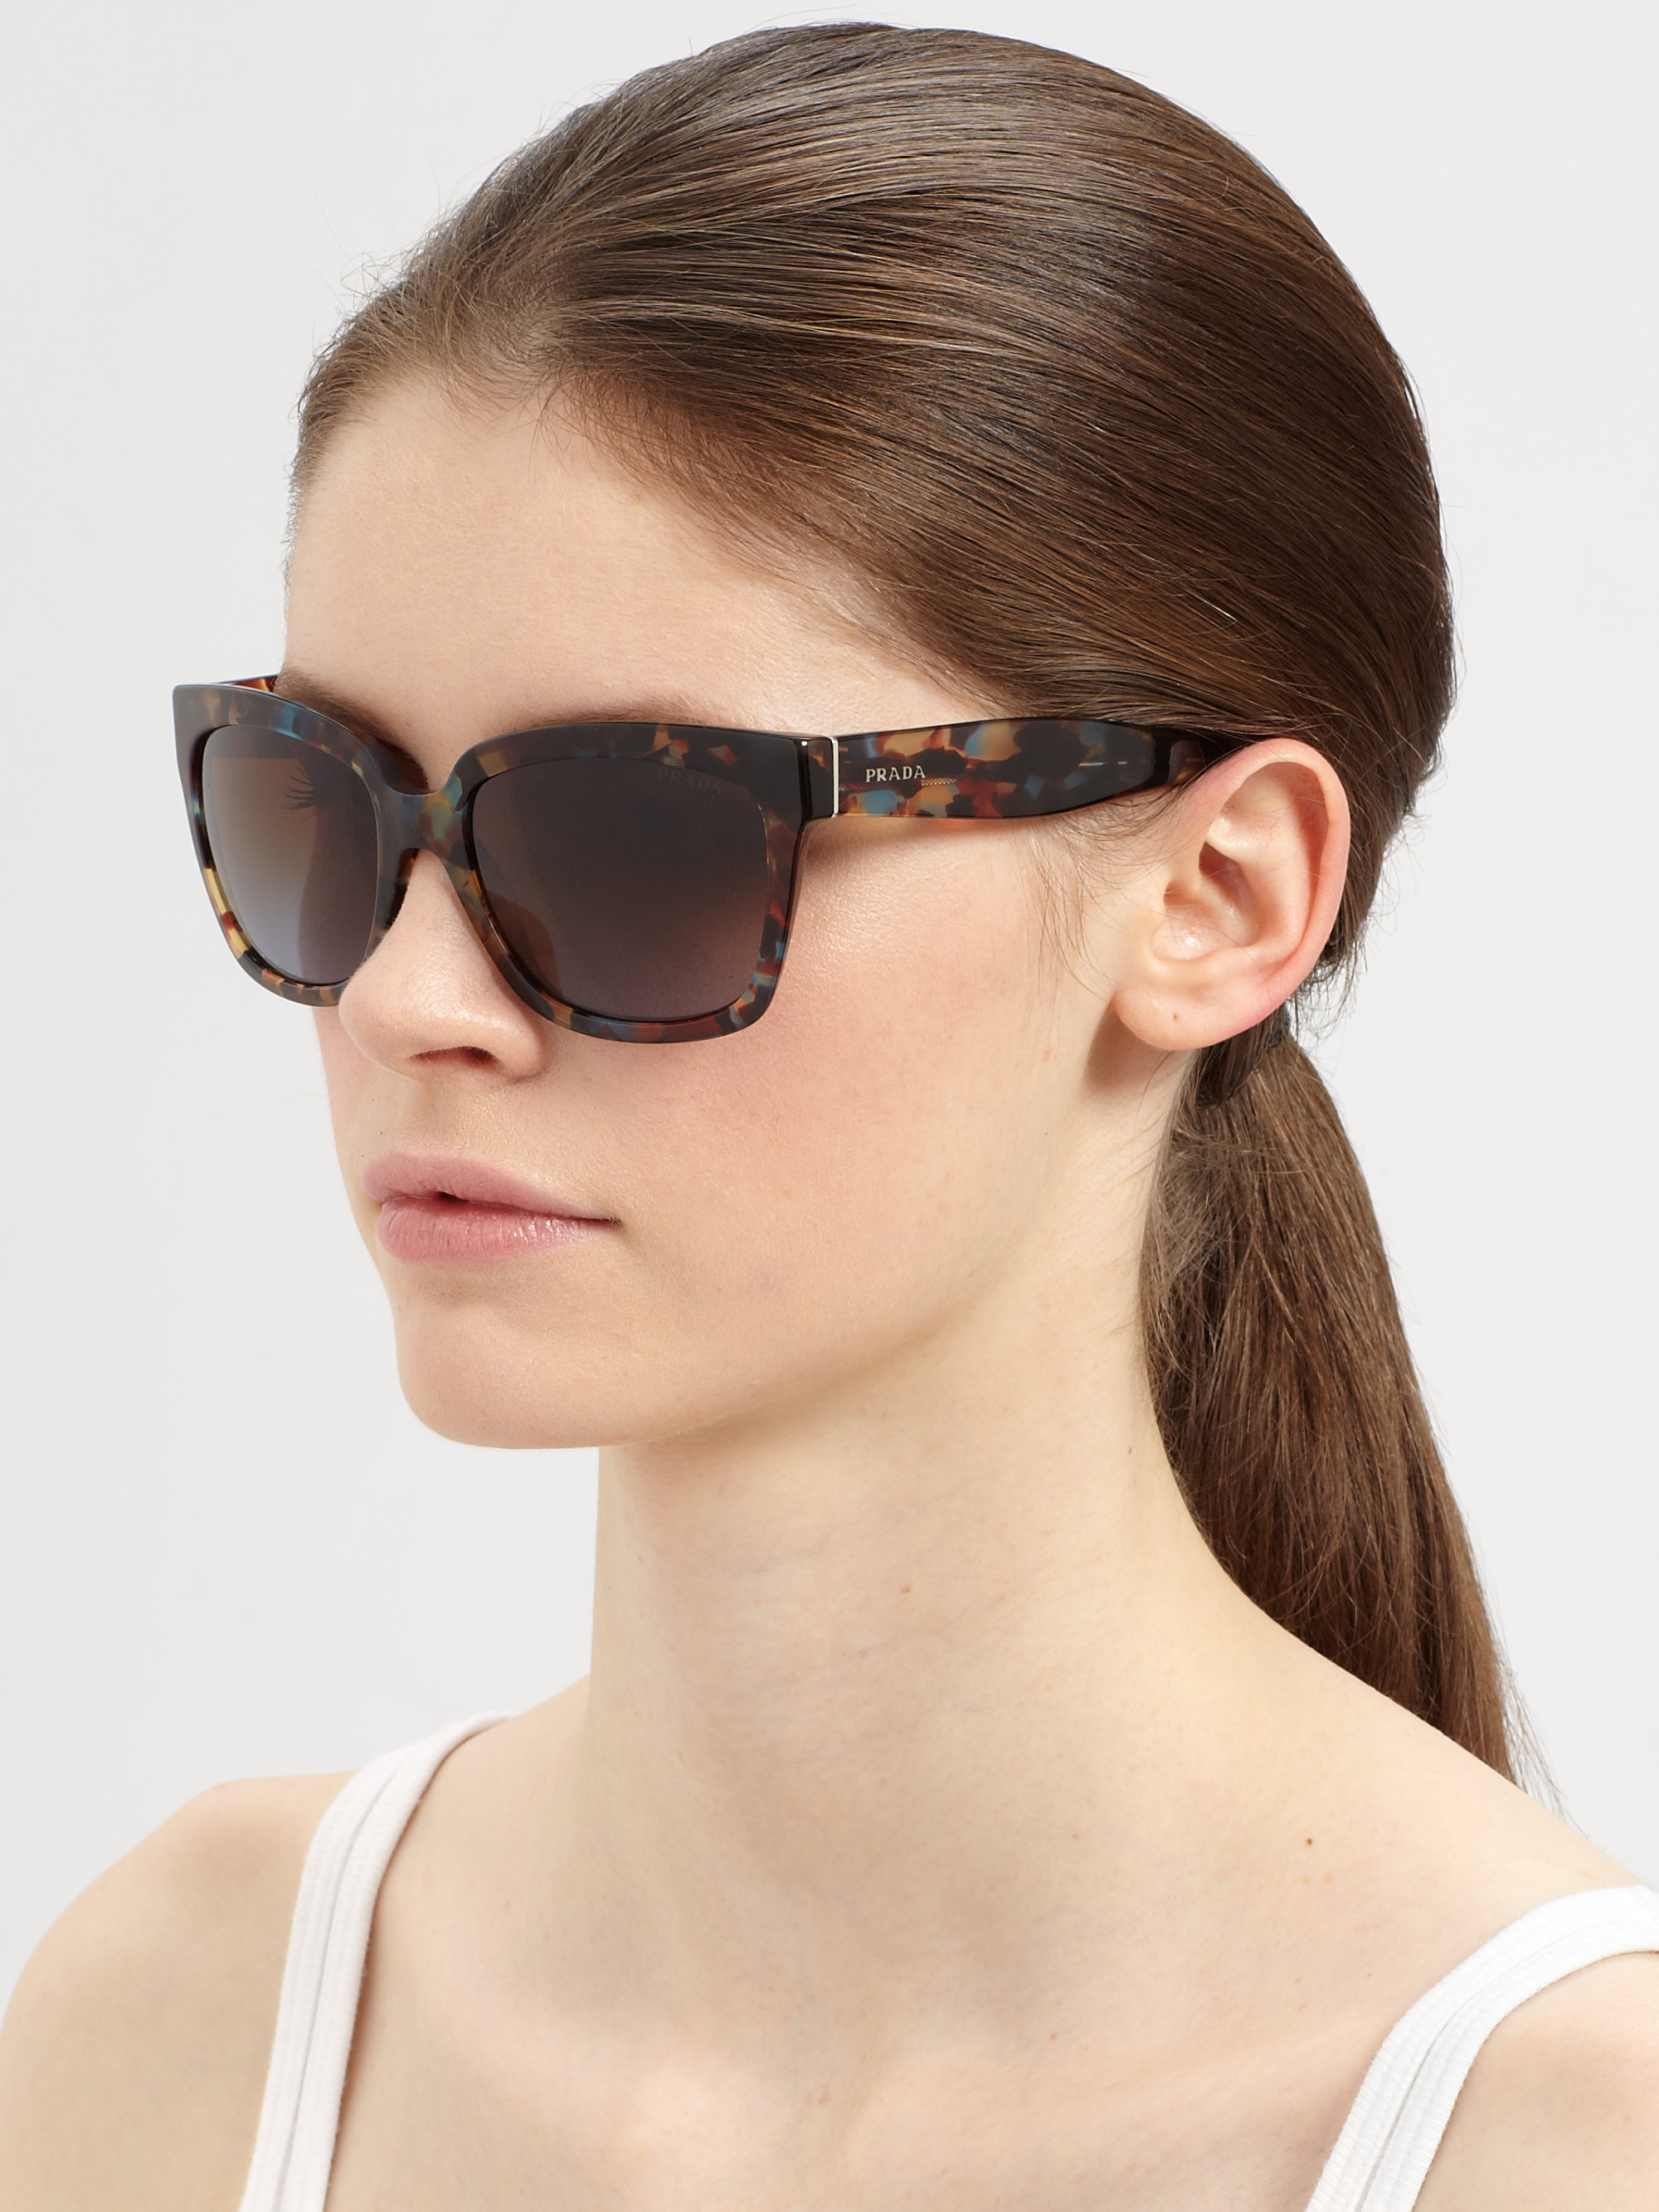 7b6c2804c74 Lyst - Prada Women s Confetti Square Sunglasses - Black in Black